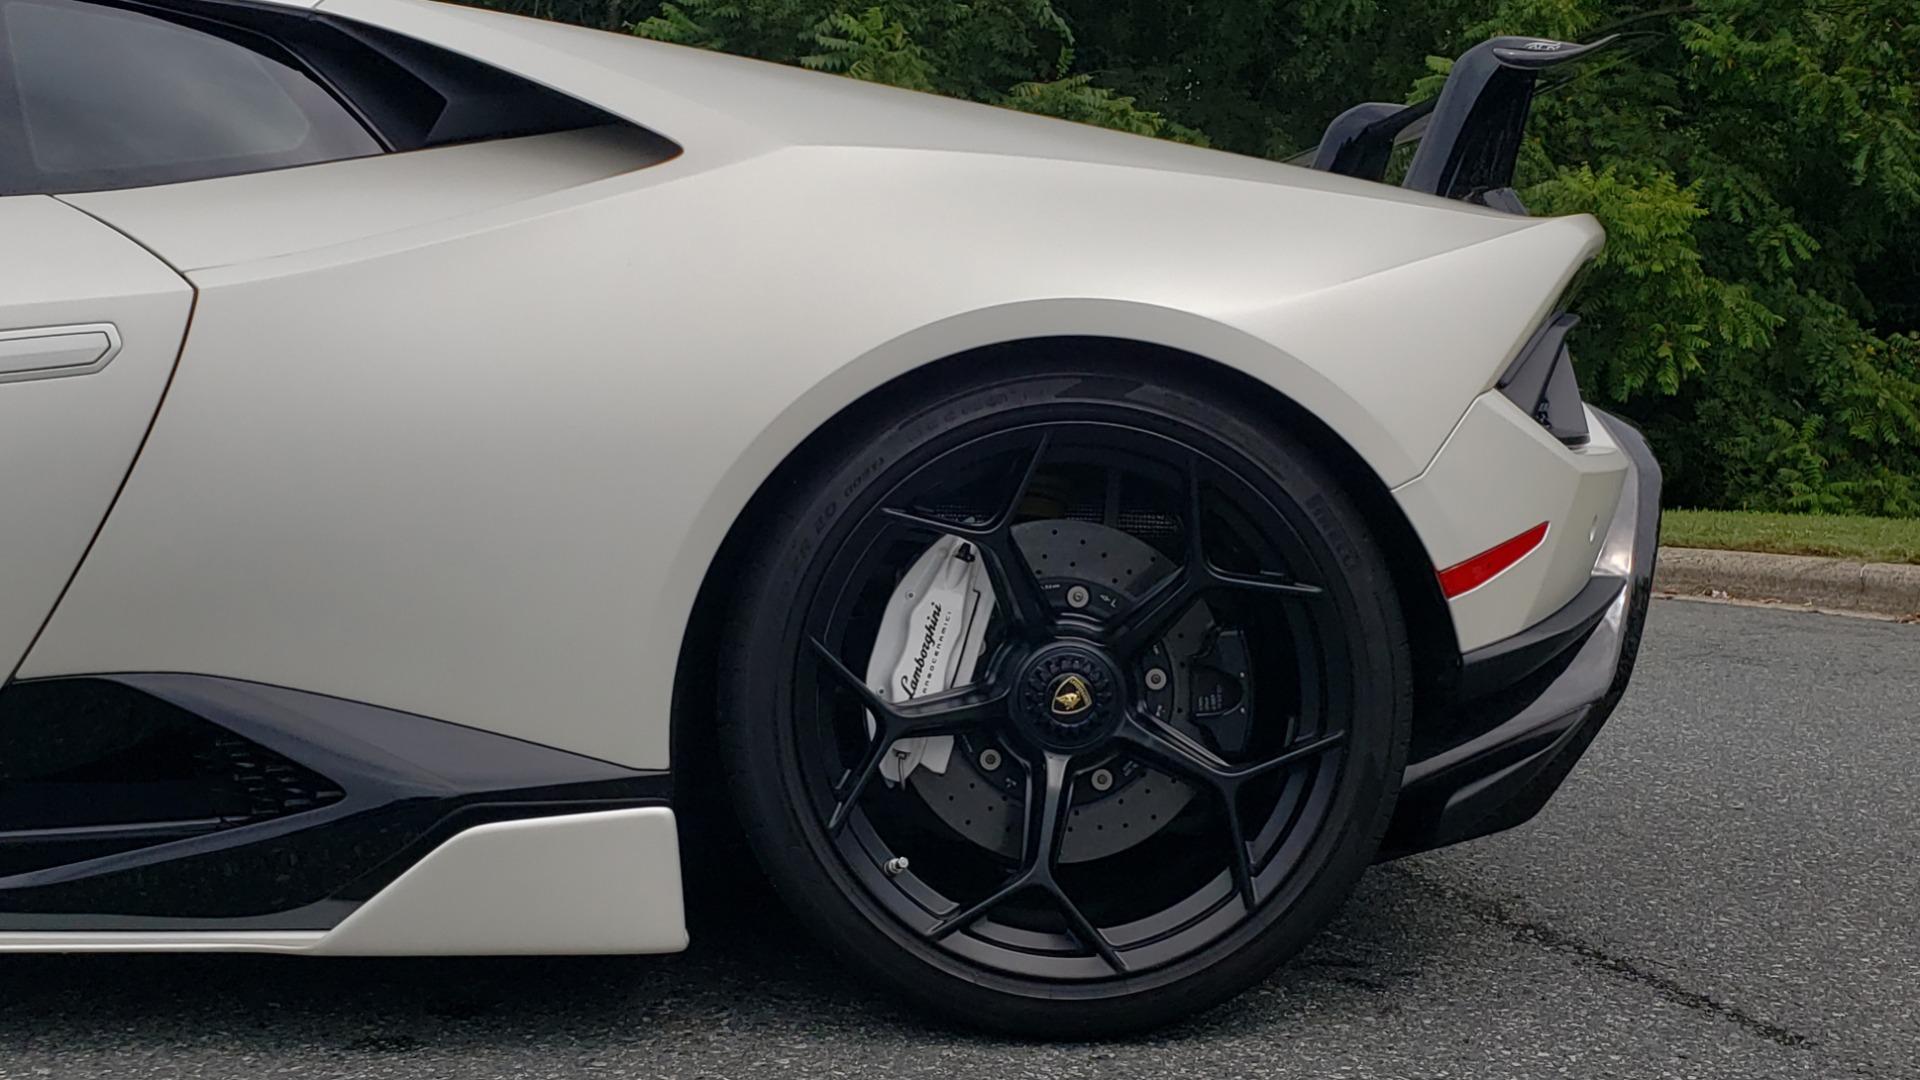 Used 2018 Lamborghini HURACAN PERFORMANTE 5.2L V10 / 630HP / 7-SPD AUTO / AWD / NAV / PREM SND for sale $269,995 at Formula Imports in Charlotte NC 28227 81